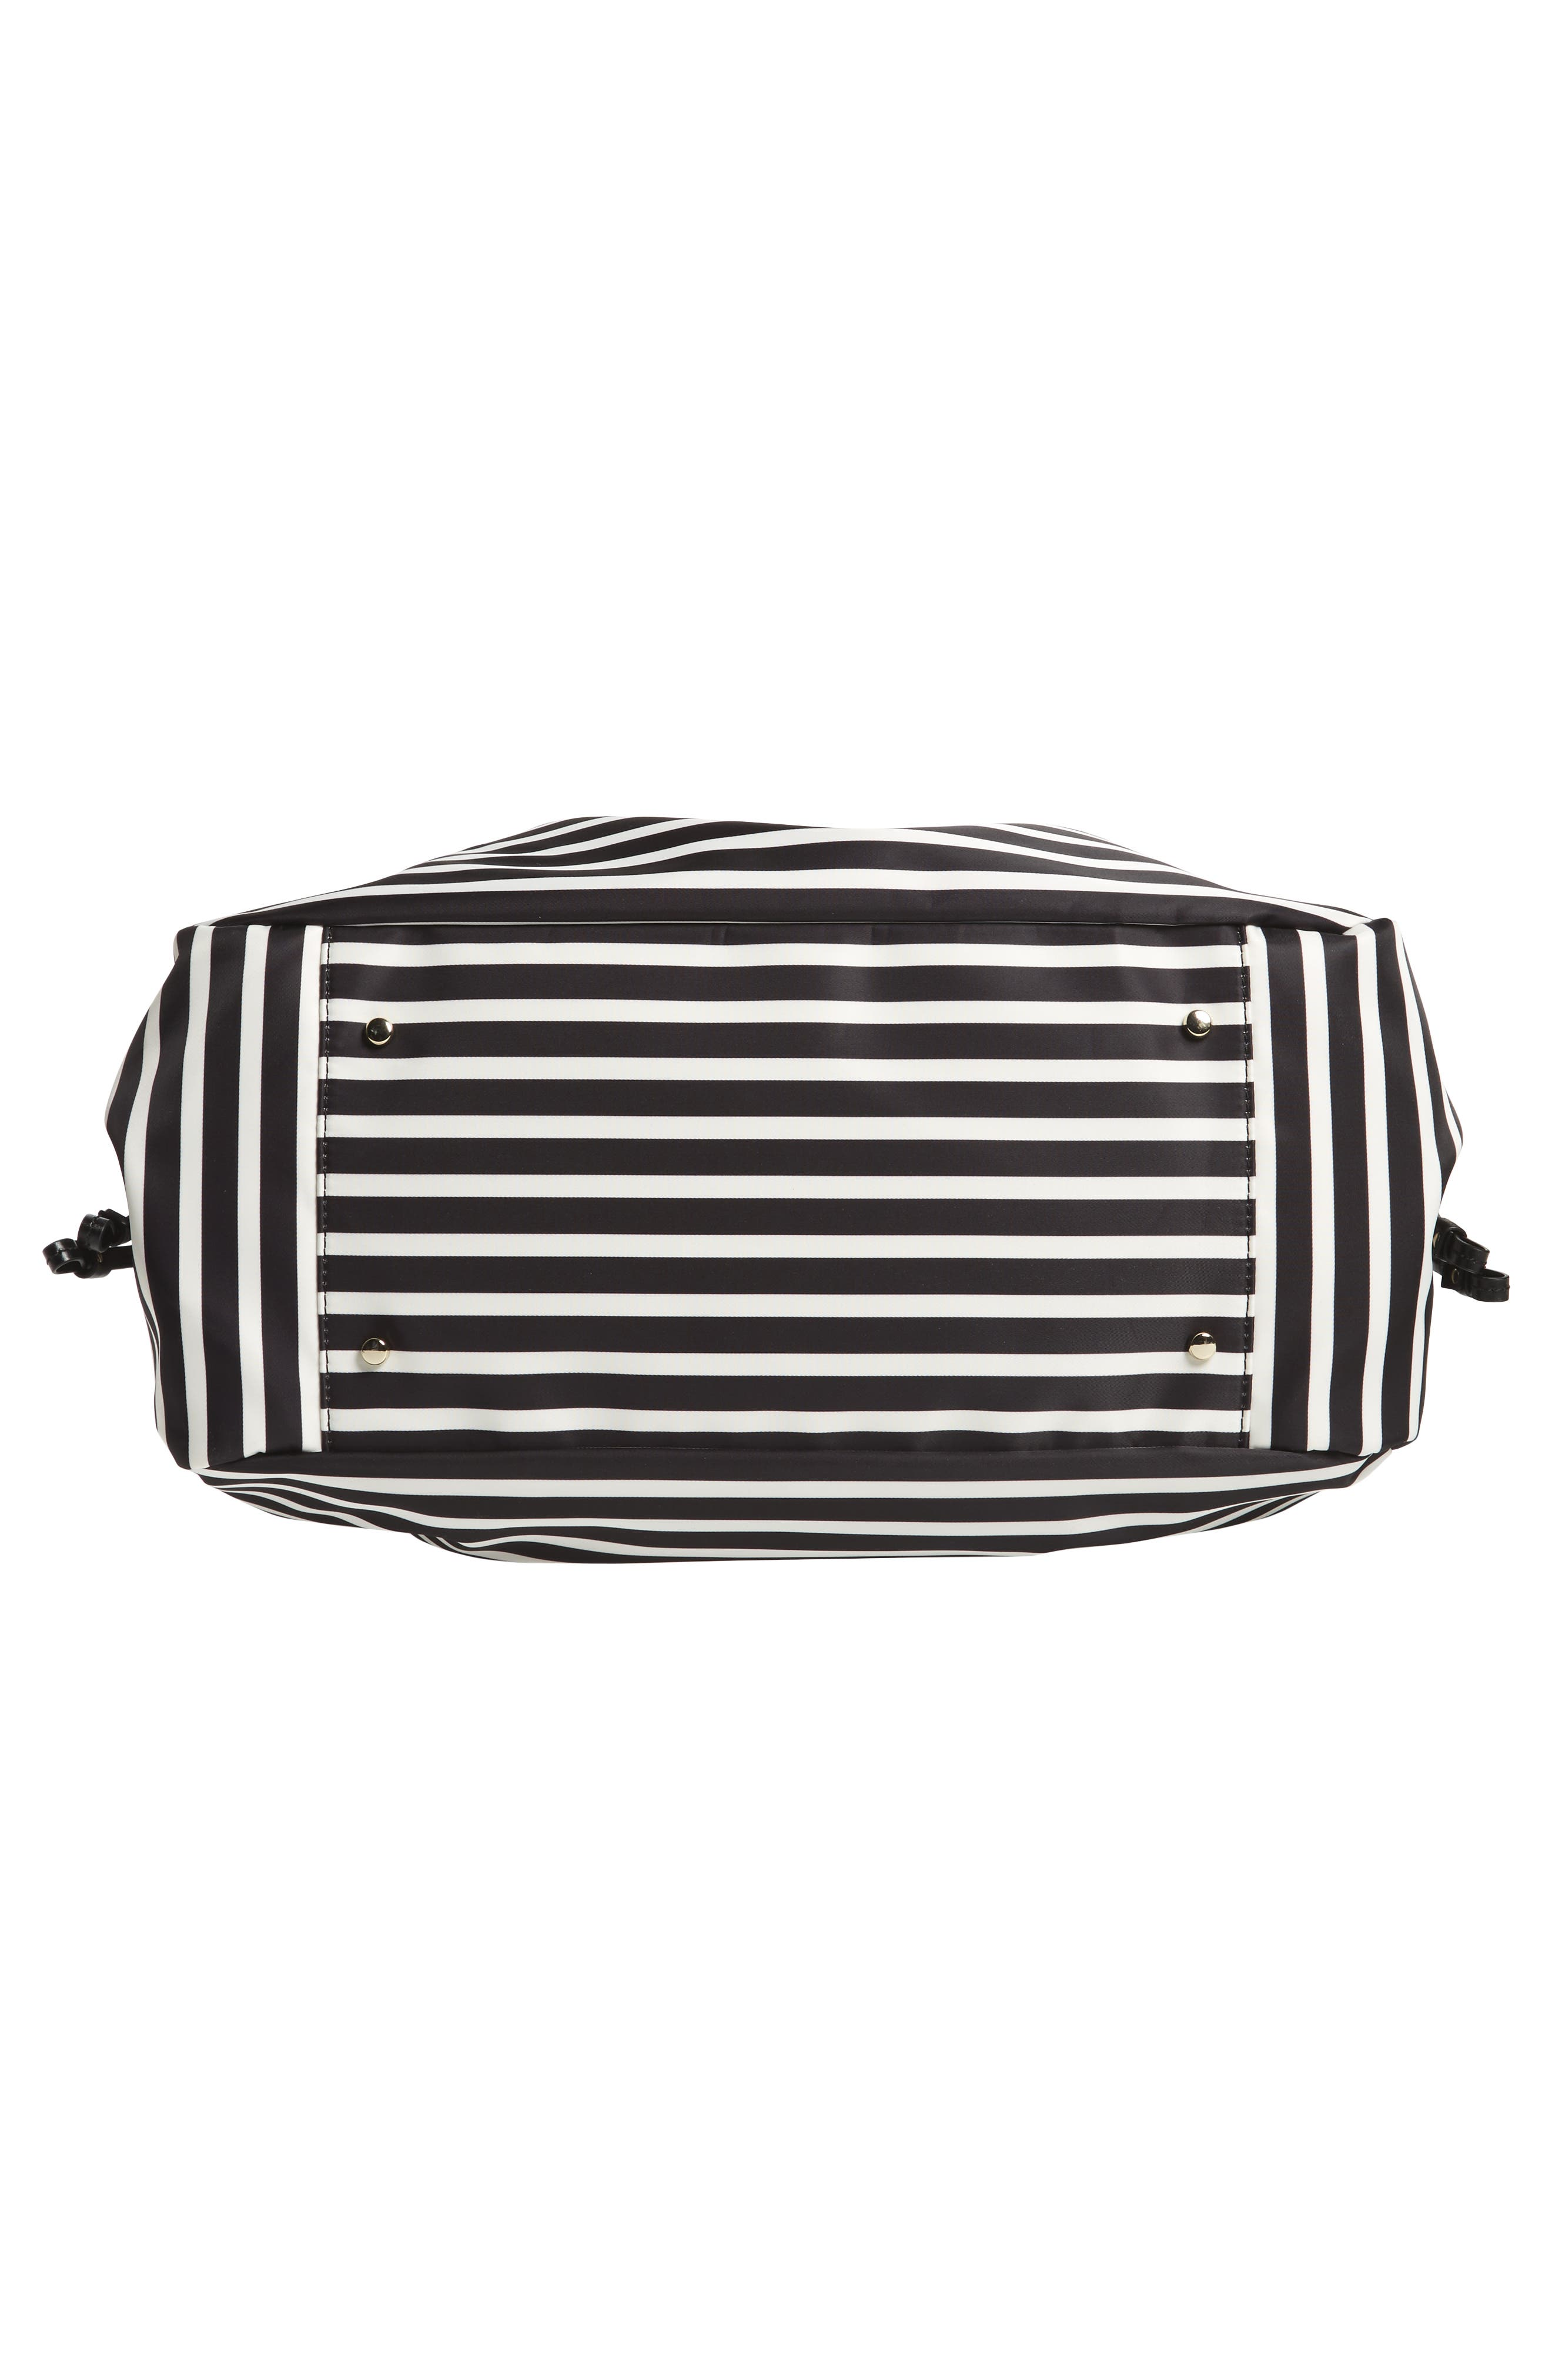 watson lane - stevie diaper bag,                             Alternate thumbnail 6, color,                             Black/ Clotted Cream